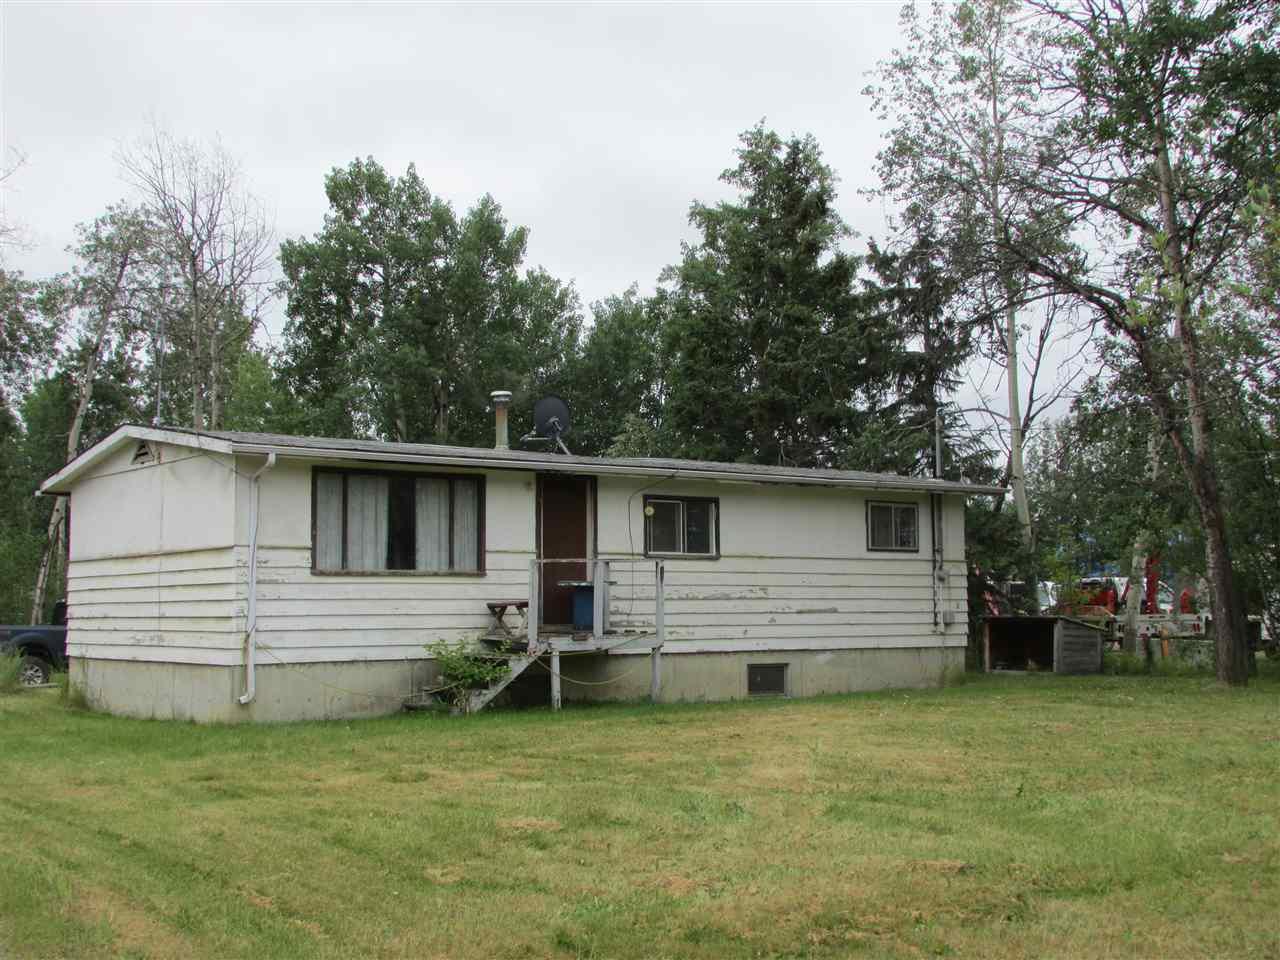 Main Photo: 11887 242 Road in Fort St. John: Fort St. John - Rural W 100th House for sale (Fort St. John (Zone 60))  : MLS®# R2384209